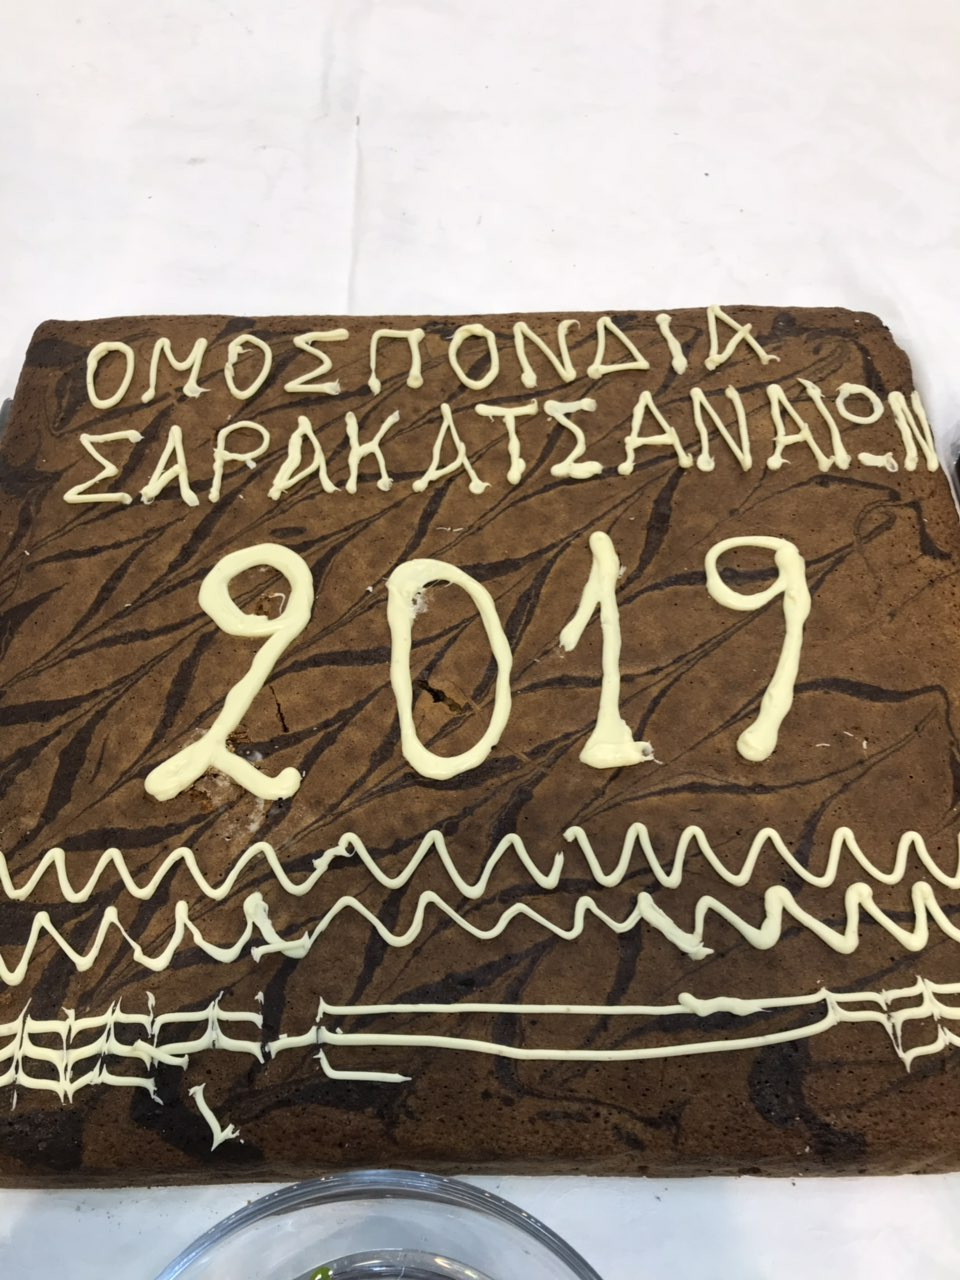 pita sarakatsanaiwn 2019 2 - O Σεβασμιώτατος στο πανελλήνιο αντάμωμα των Σαρακατσαναίων.